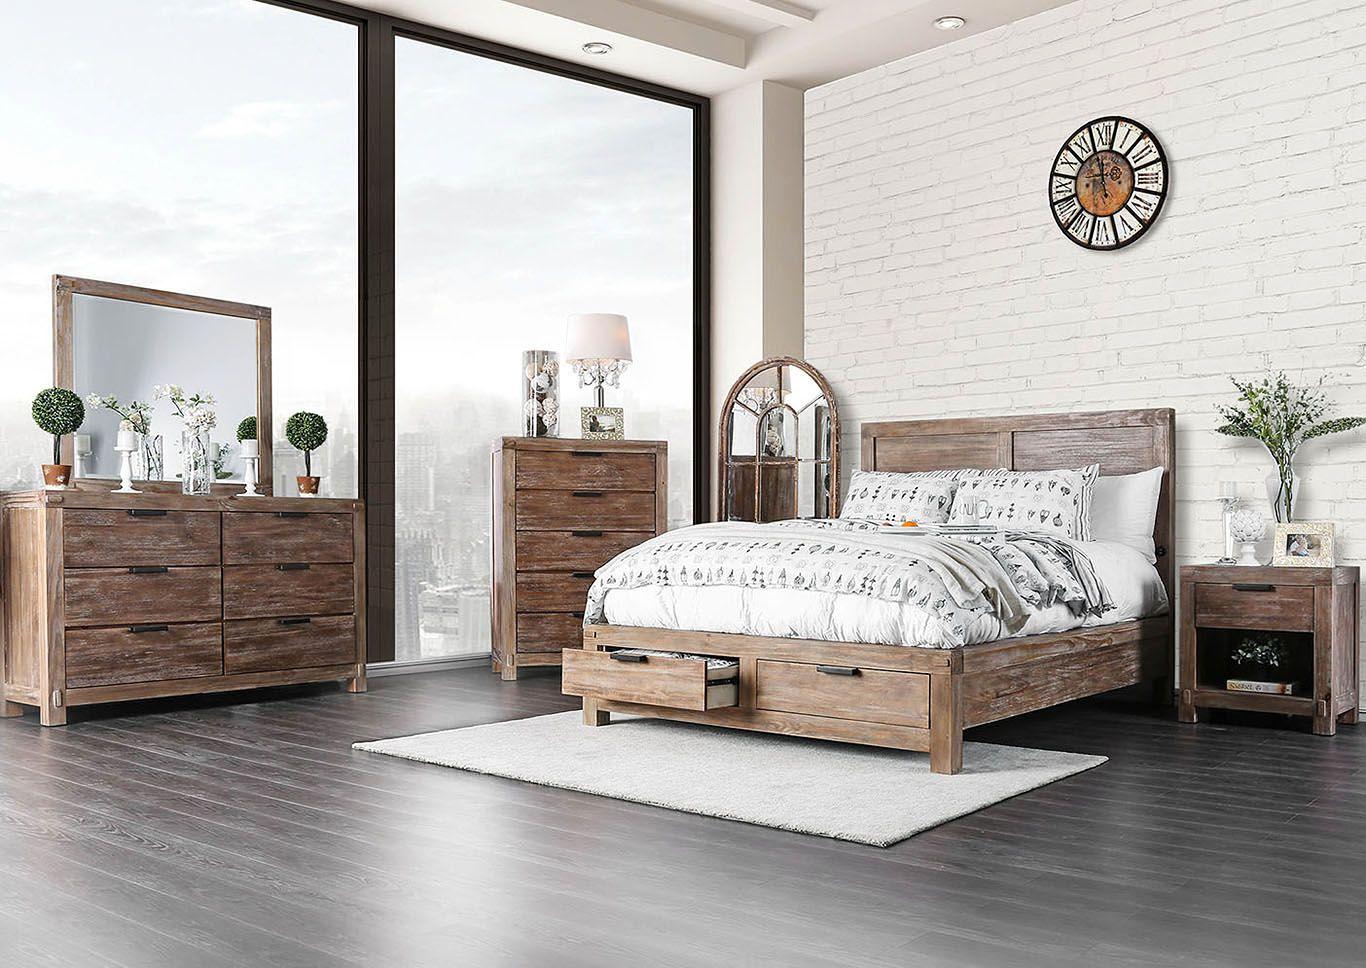 Wynton Eastern King Bed King storage bed, Furniture